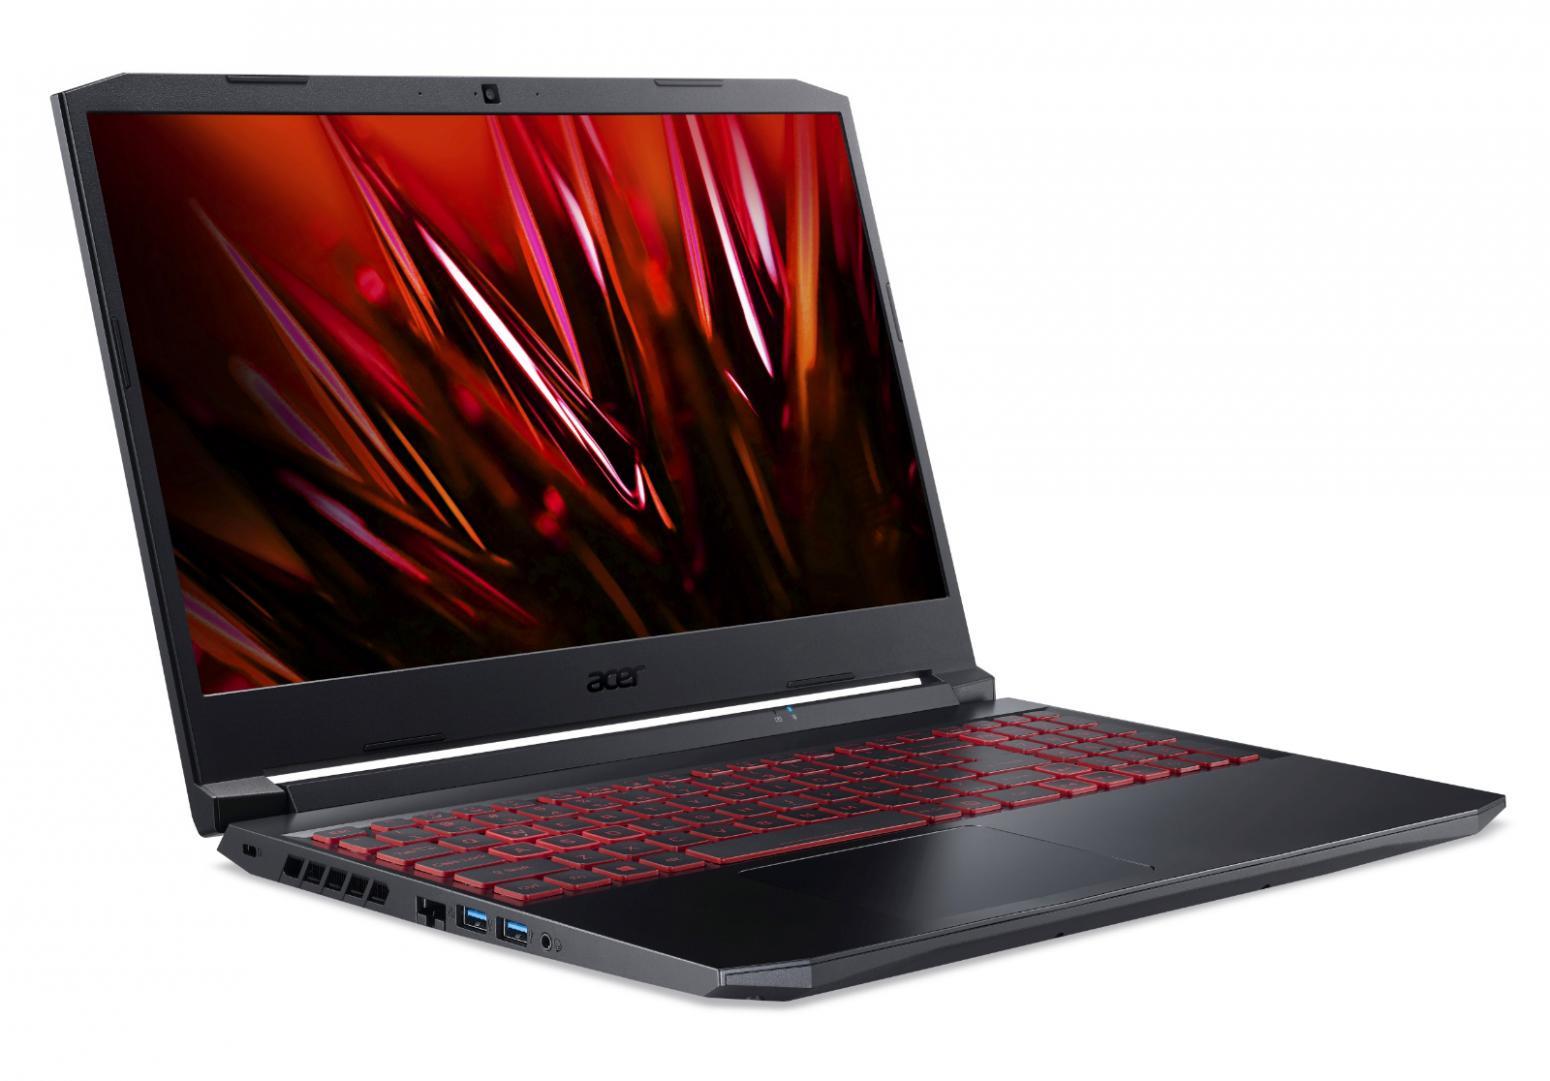 Image du PC portable Acer Nitro 5 AN515-45-R90U - RTX 3080, 360Hz